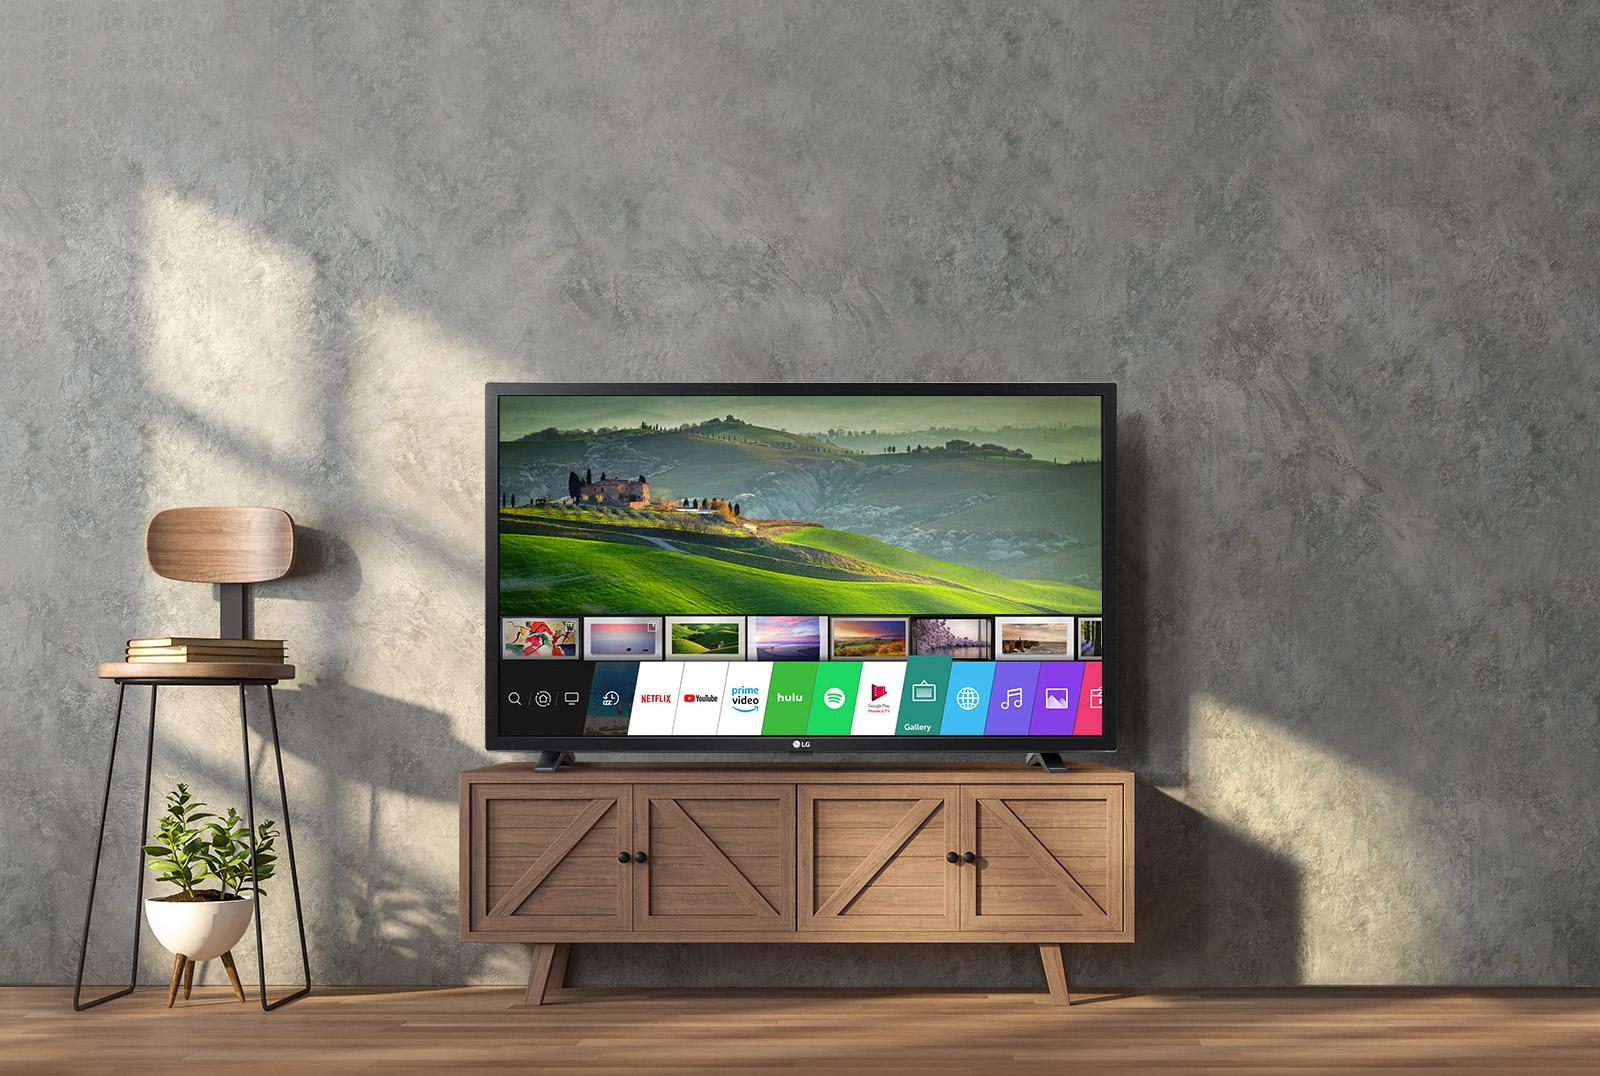 Телевизор_LG 32LM6300PLA_1.jpg